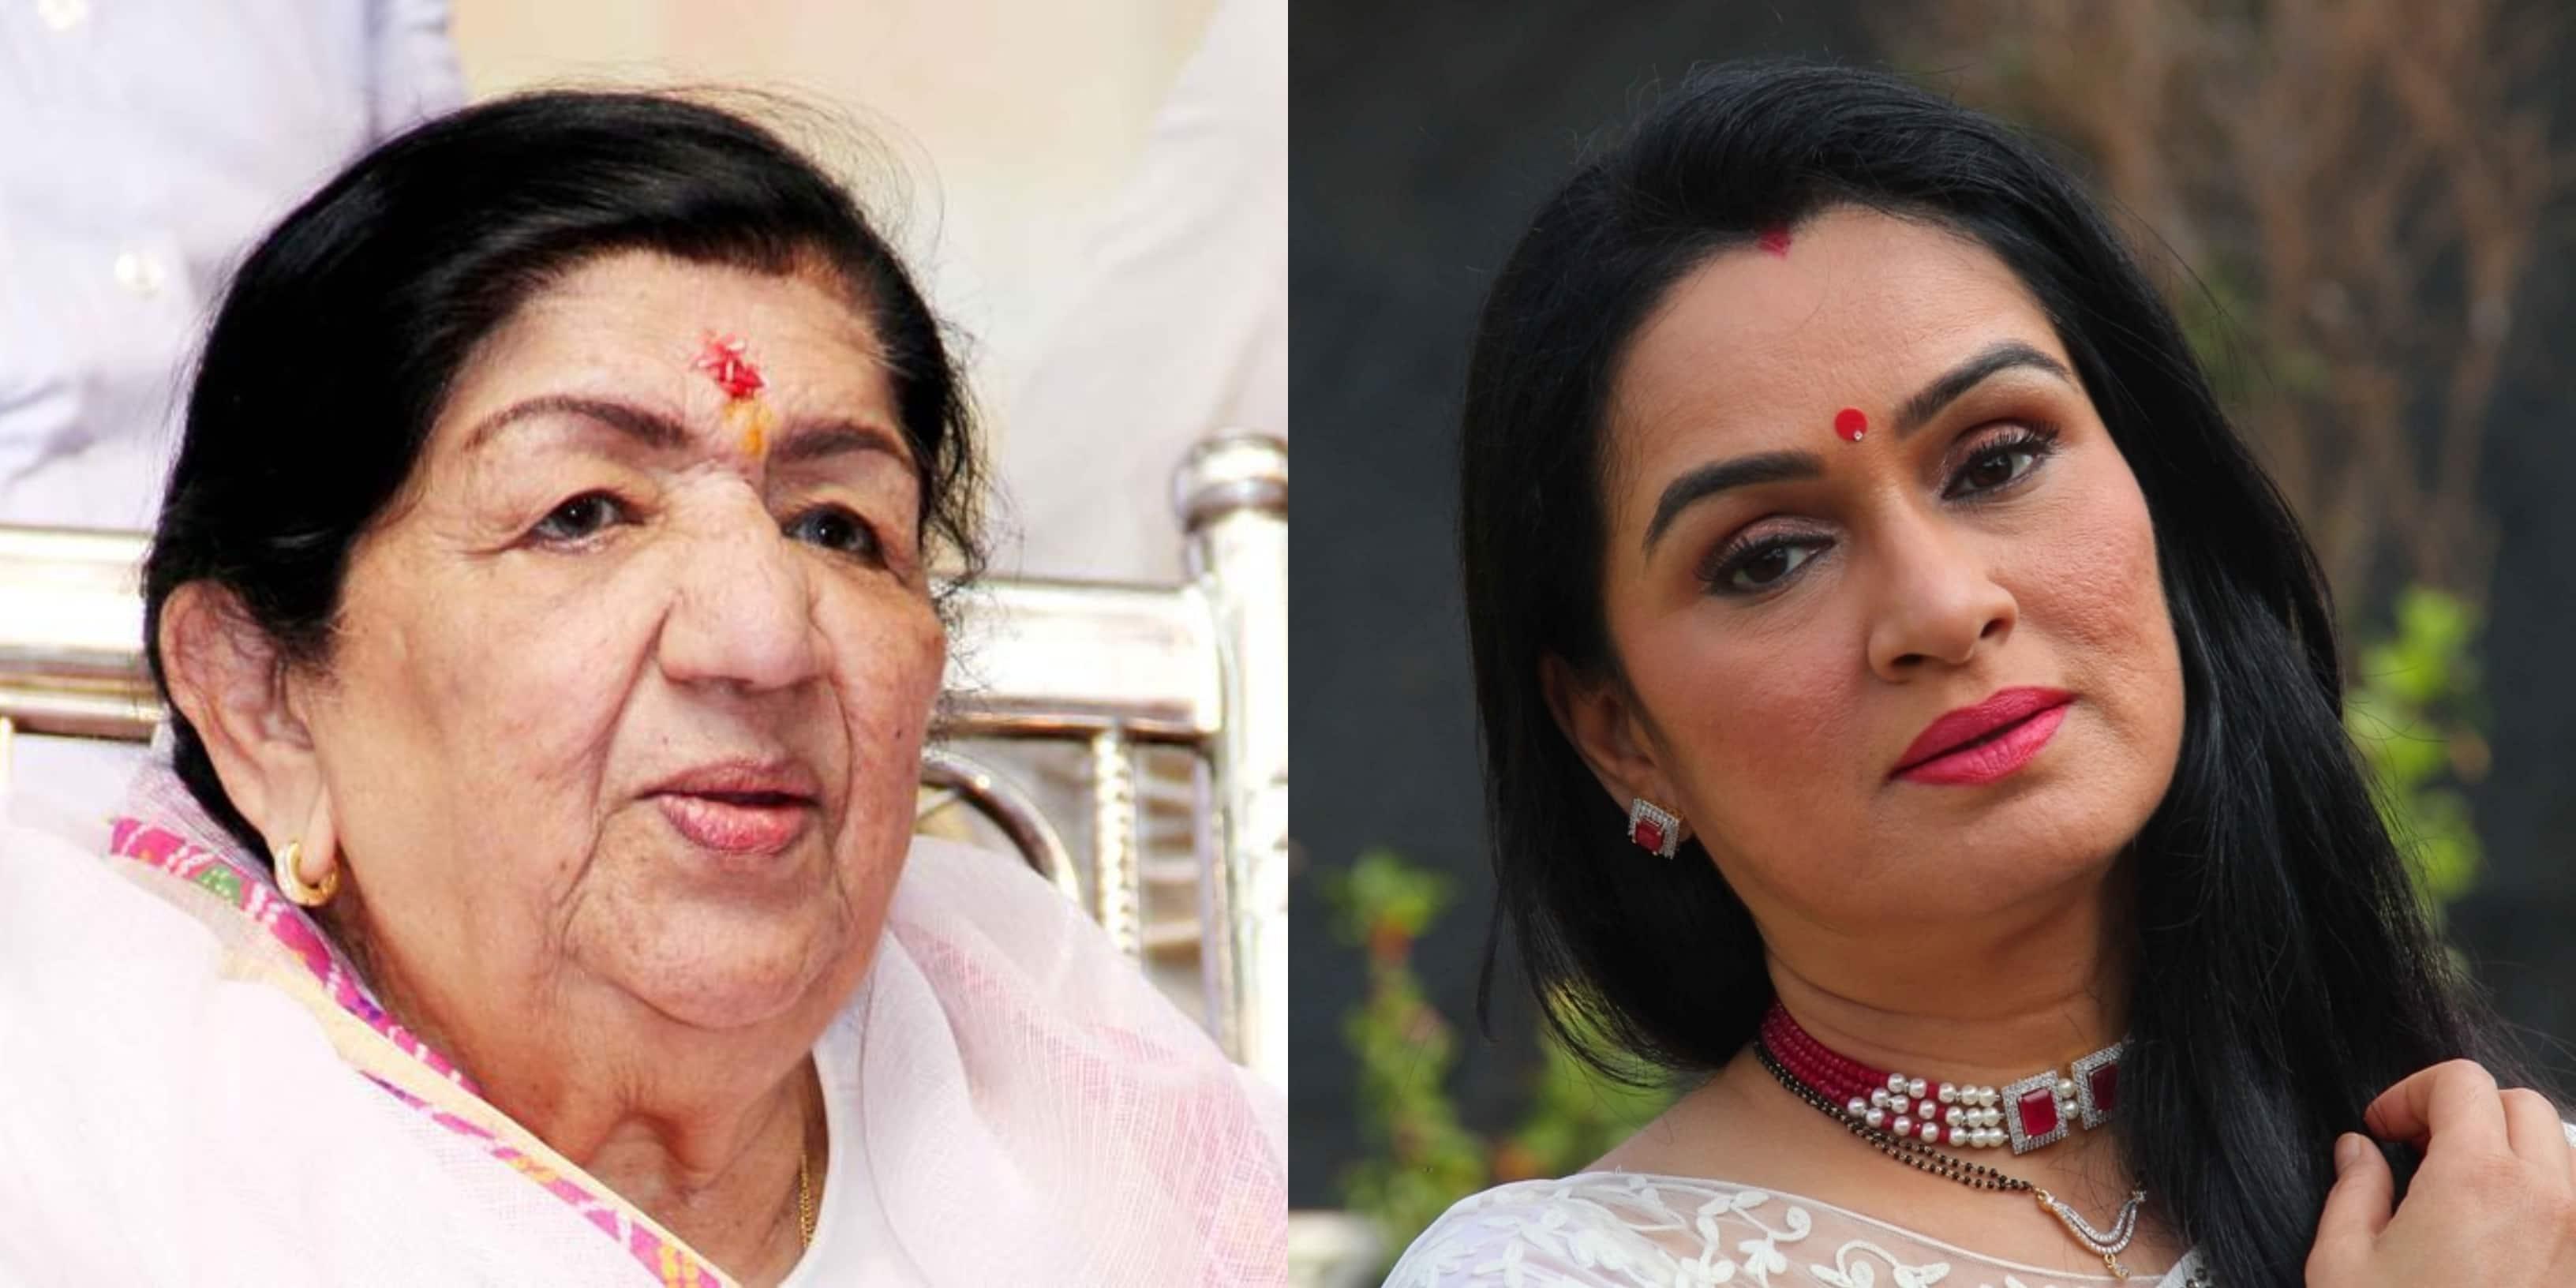 Lata Mangeshkar's Niece Actress Padmini Kolhapure Shares Updates On The Singer's Medical Condition